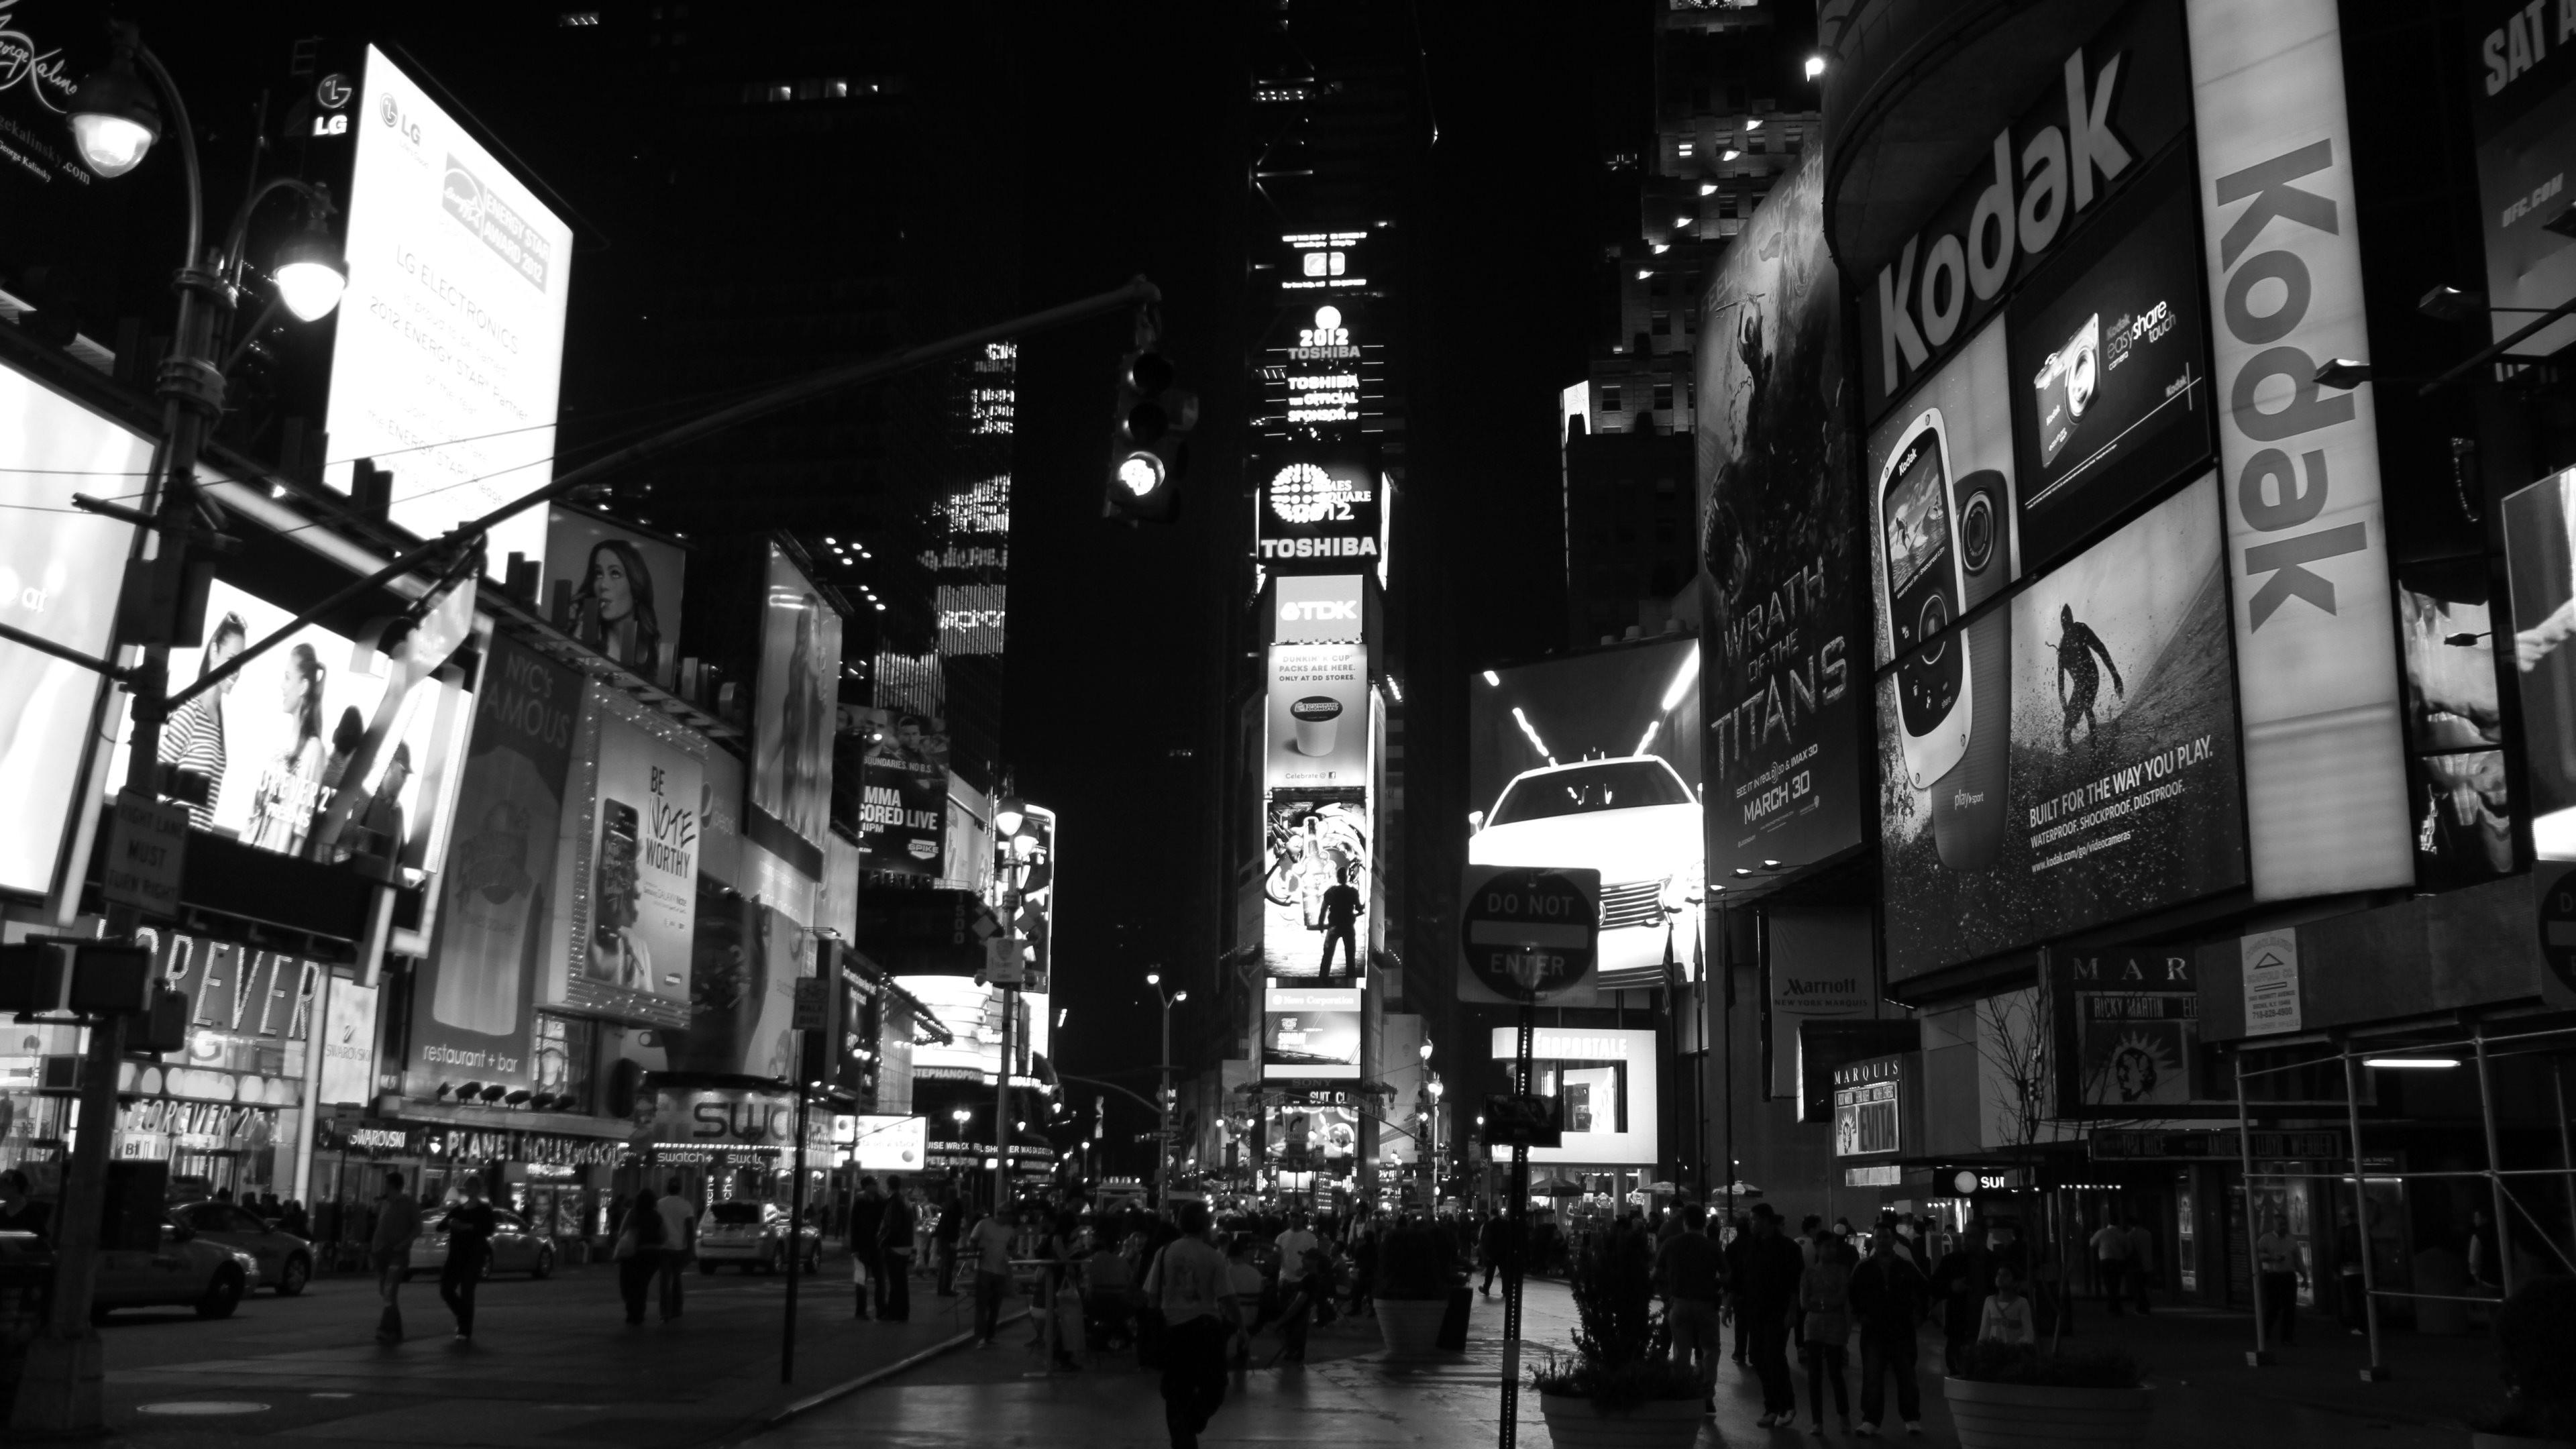 Wallpaper: Black and White. Ultra HD 4K 3840×2160